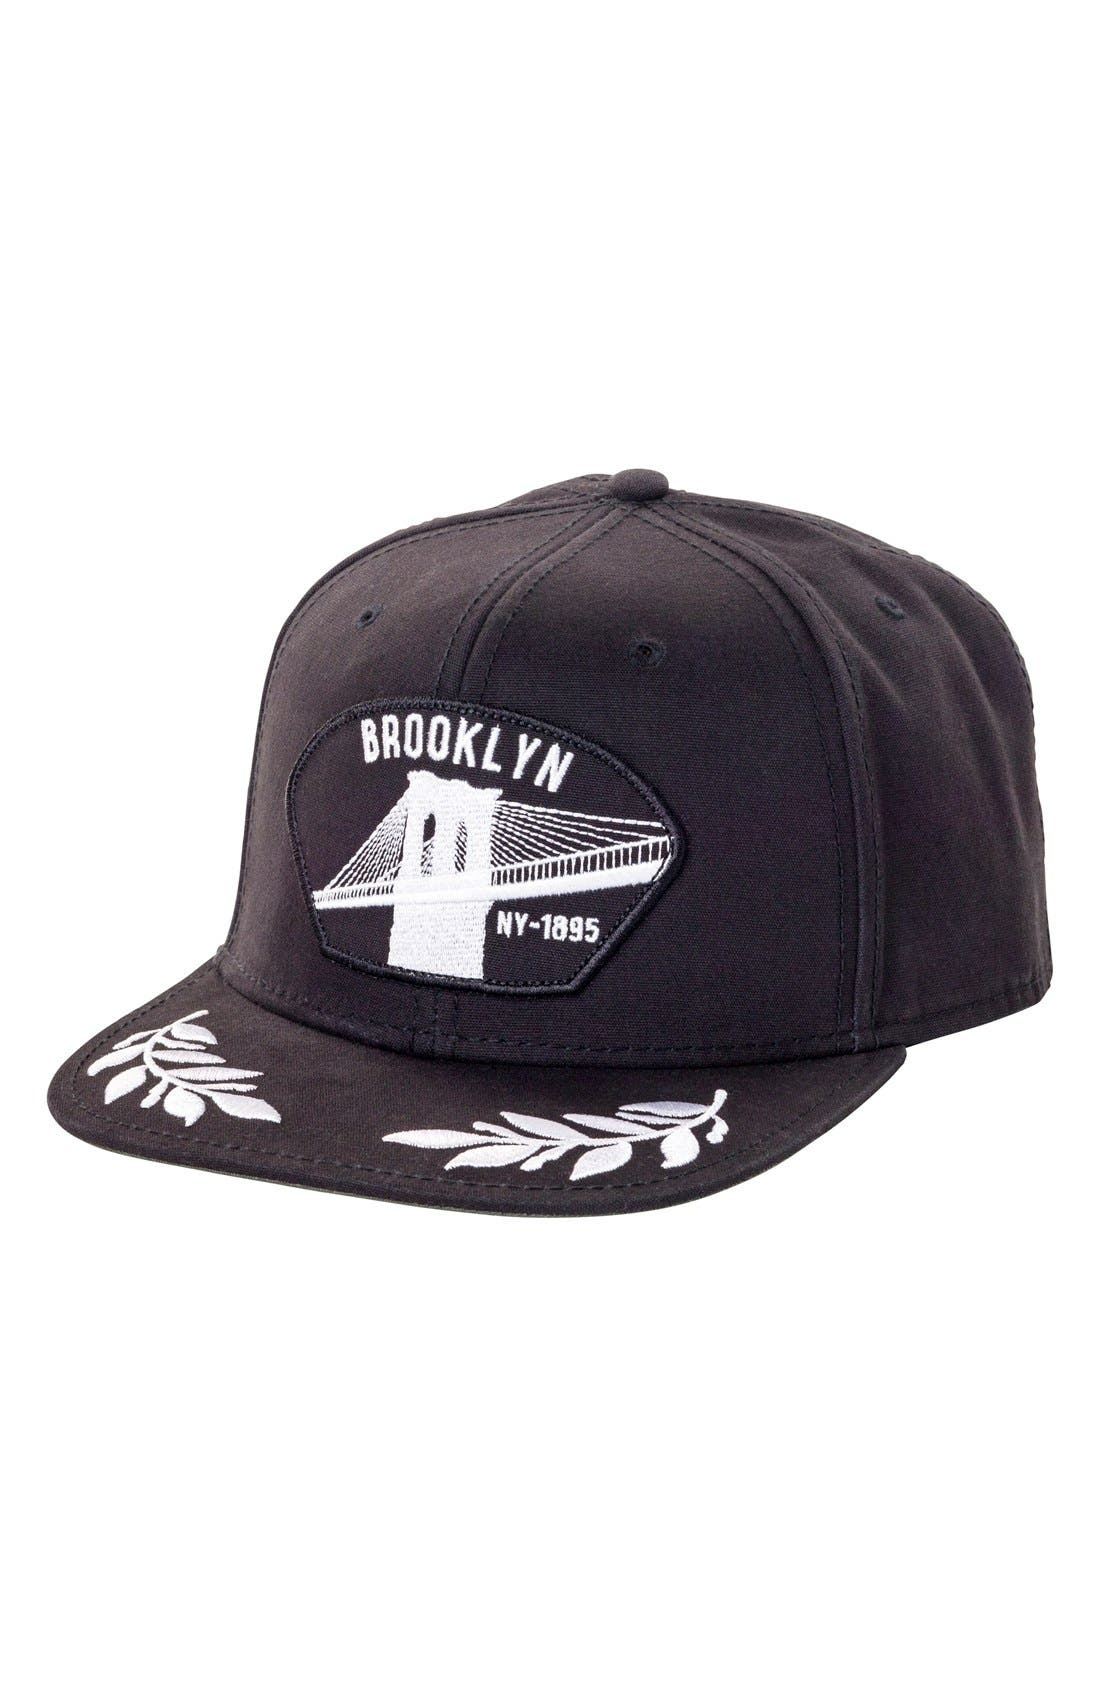 Goorin Brothers 'Brooklyn NY' Baseball Cap